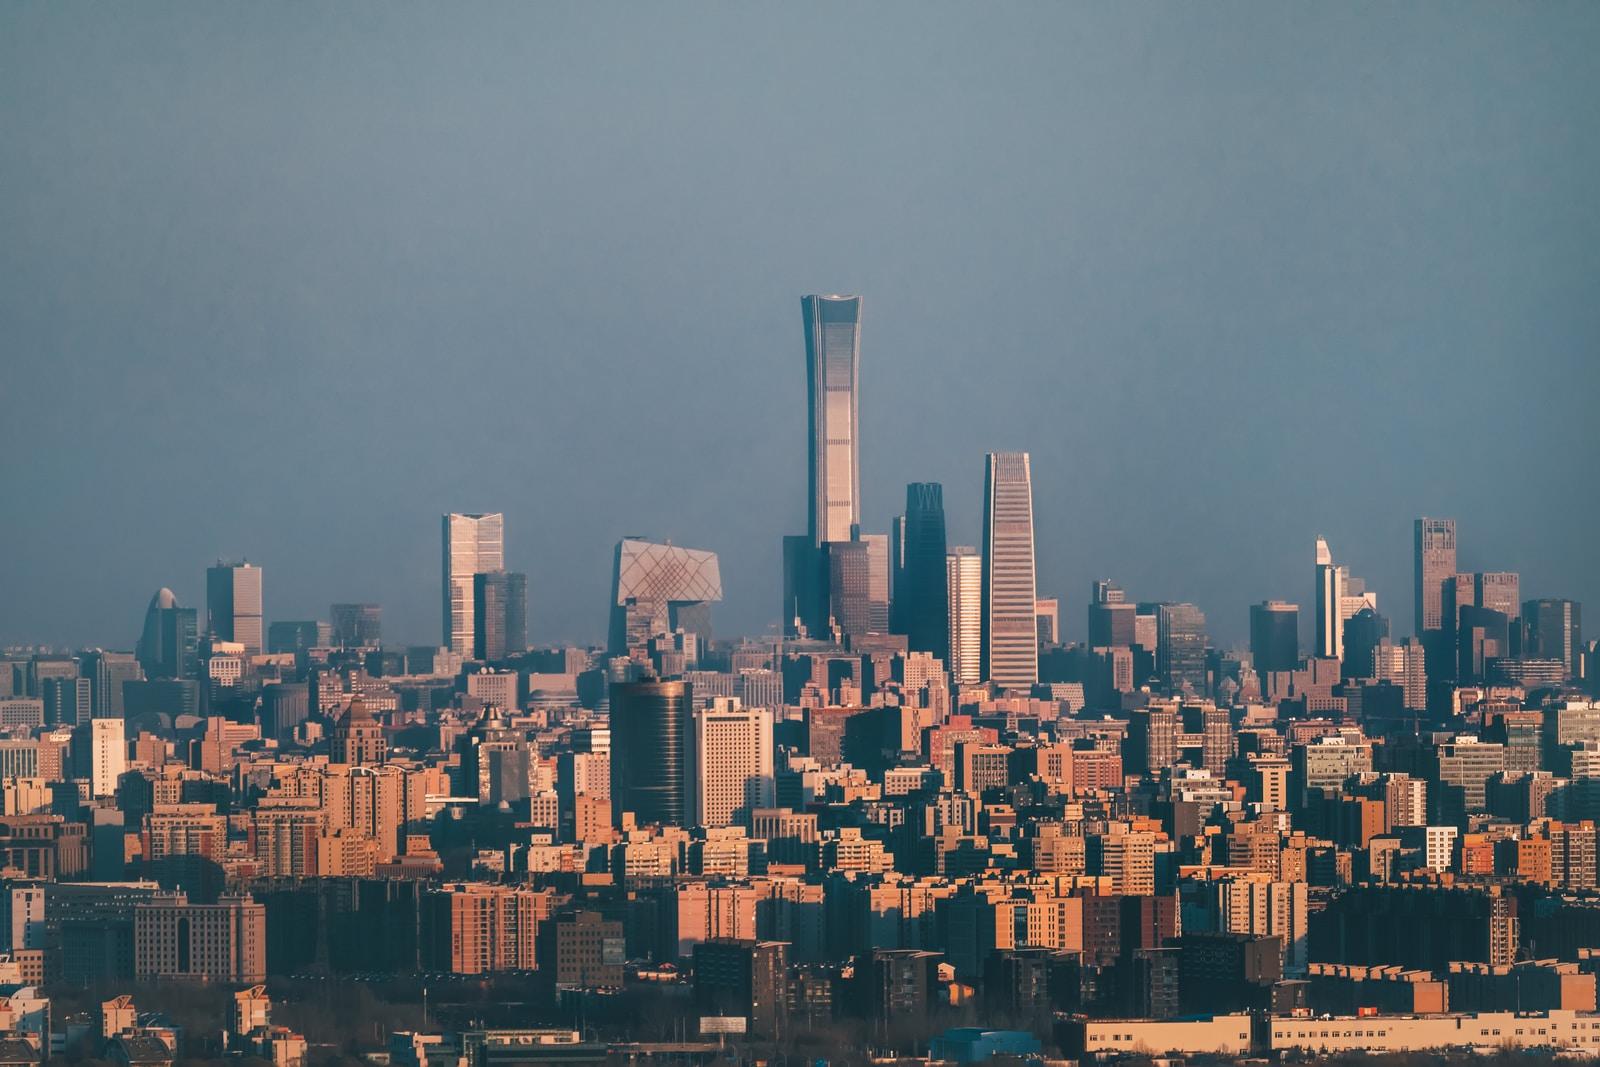 city skyline under gray sky during daytime